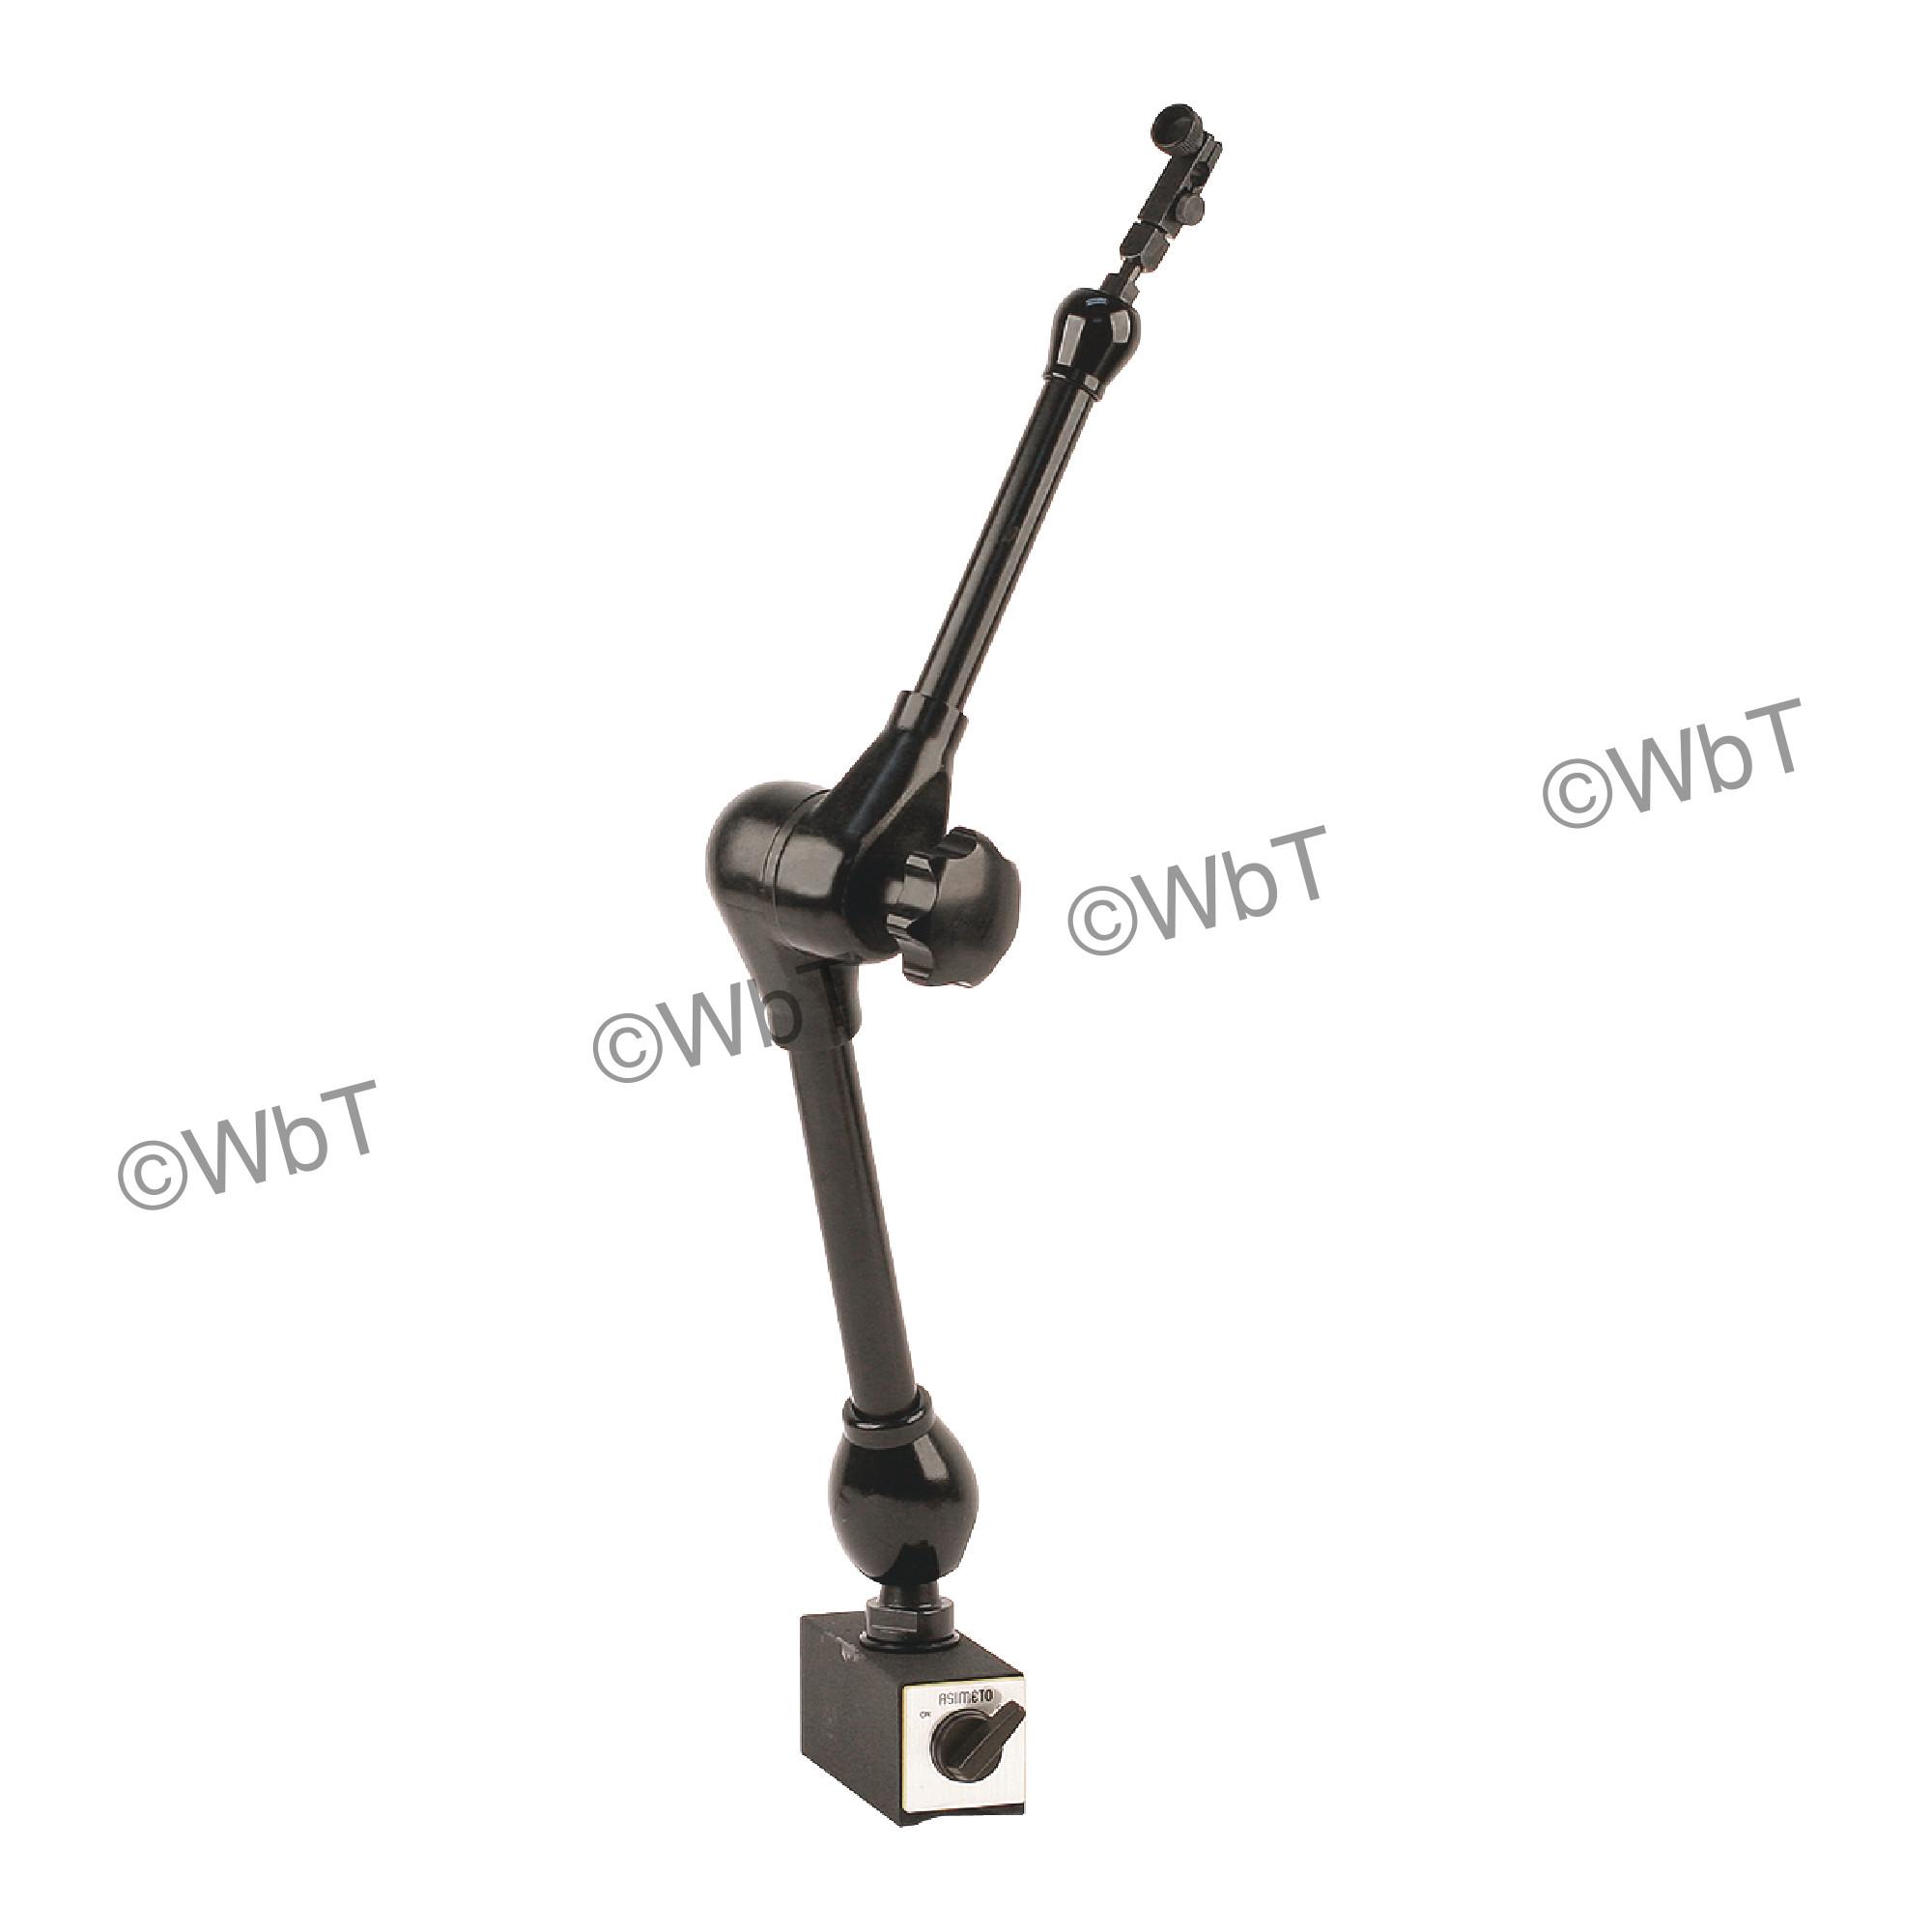 ASIMETO Articulating Arm Magnetic Base & Indicator Holder